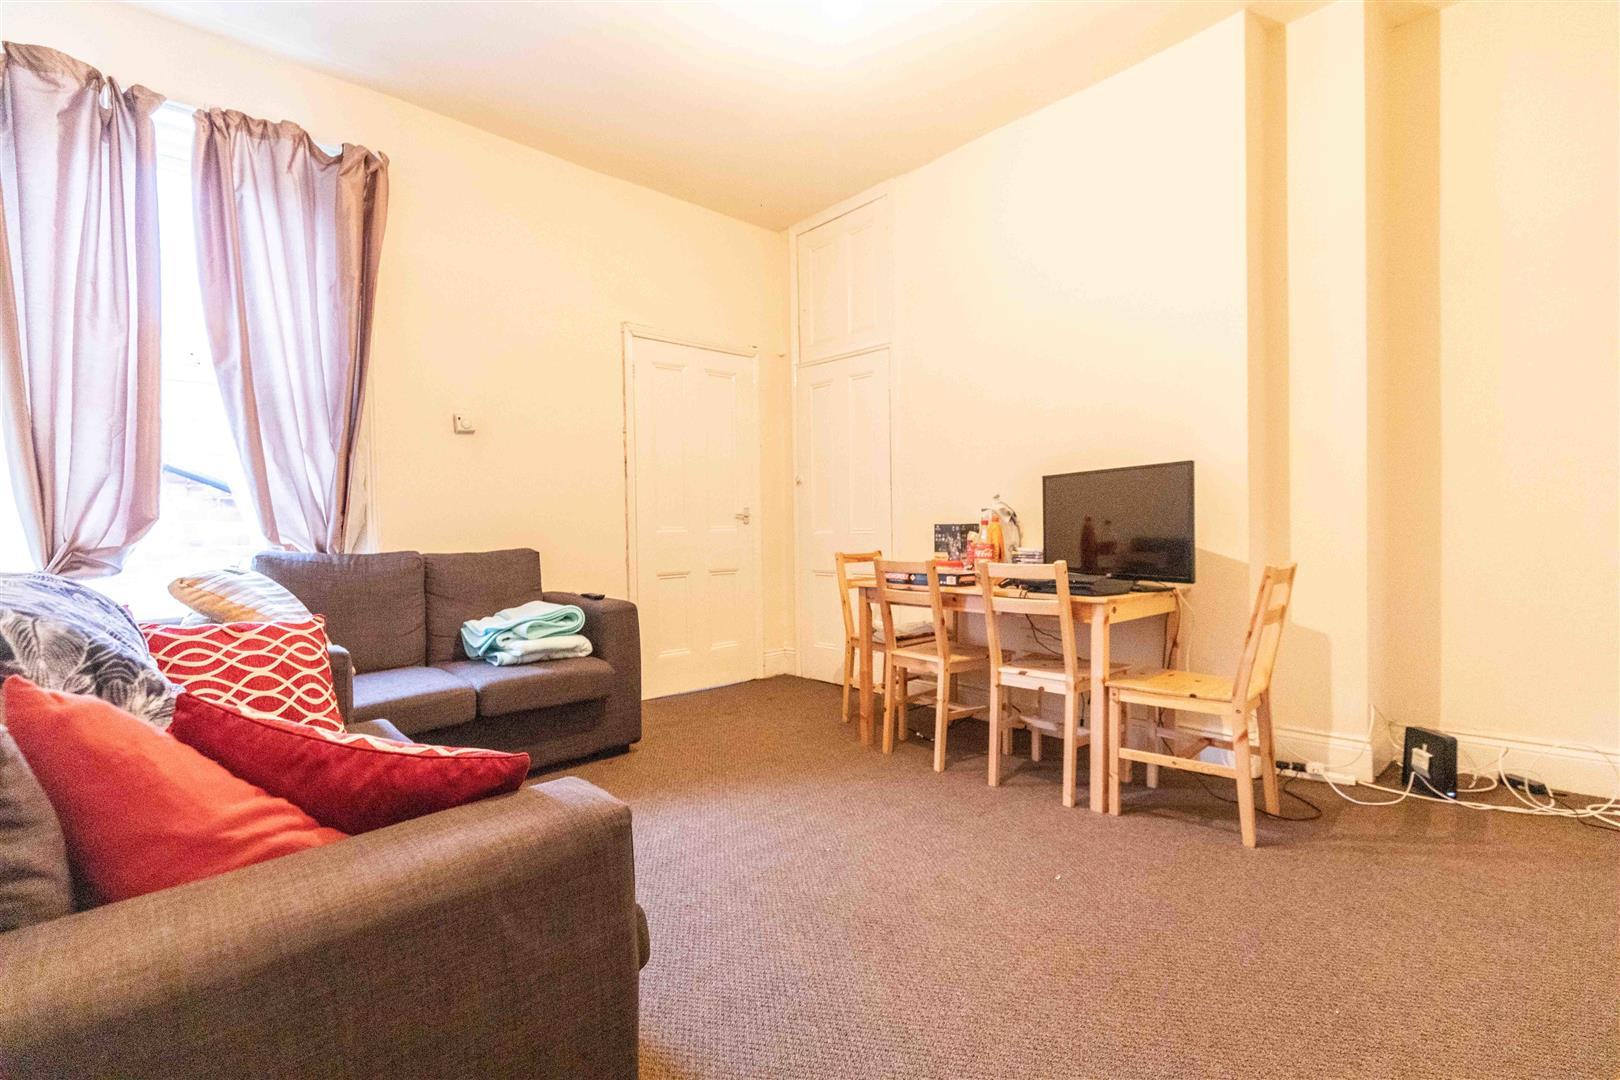 3 bed flat to rent in Hazelwood Avenue, Newcastle Upon Tyne, NE2